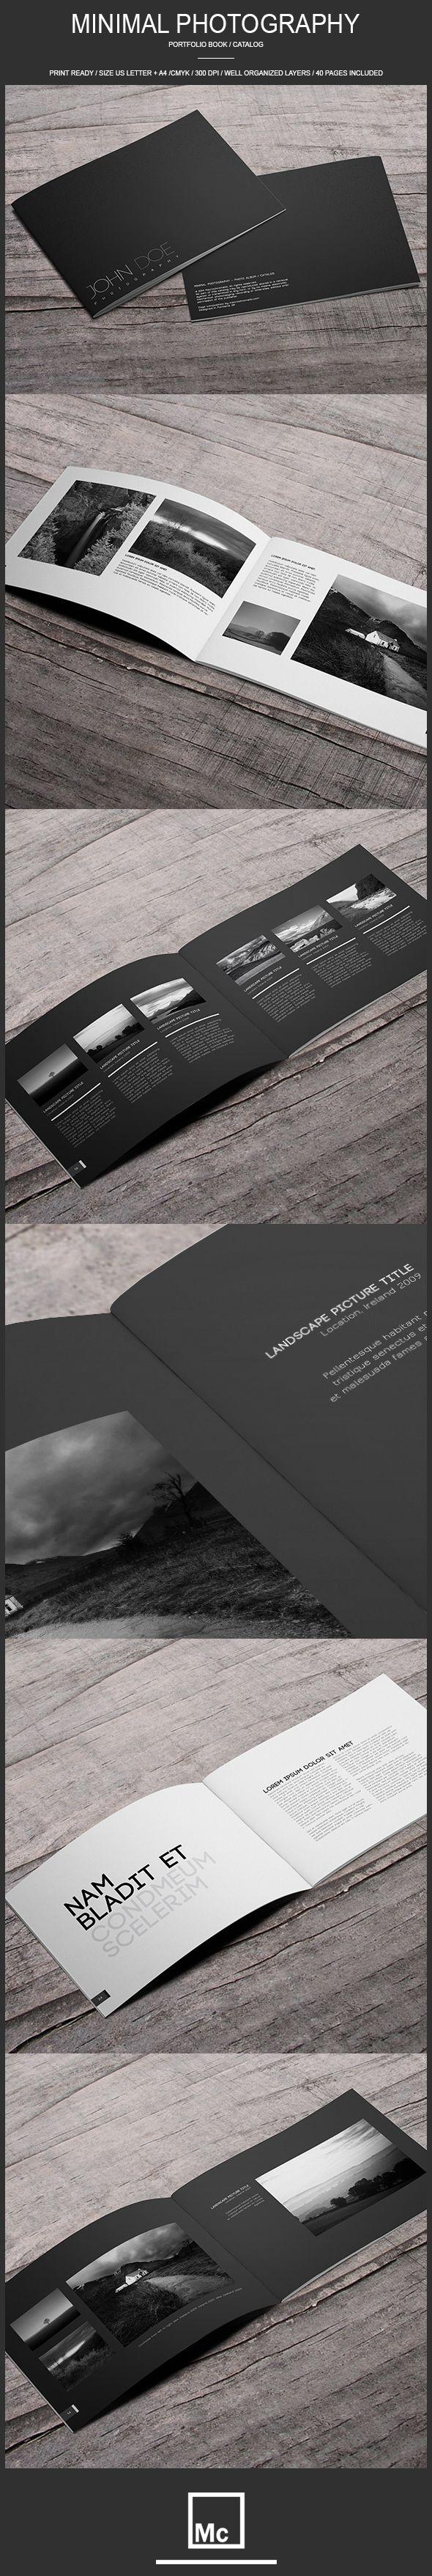 40 Page Minimal - Photography Portfolio Book by Macrochromatic, via Behance